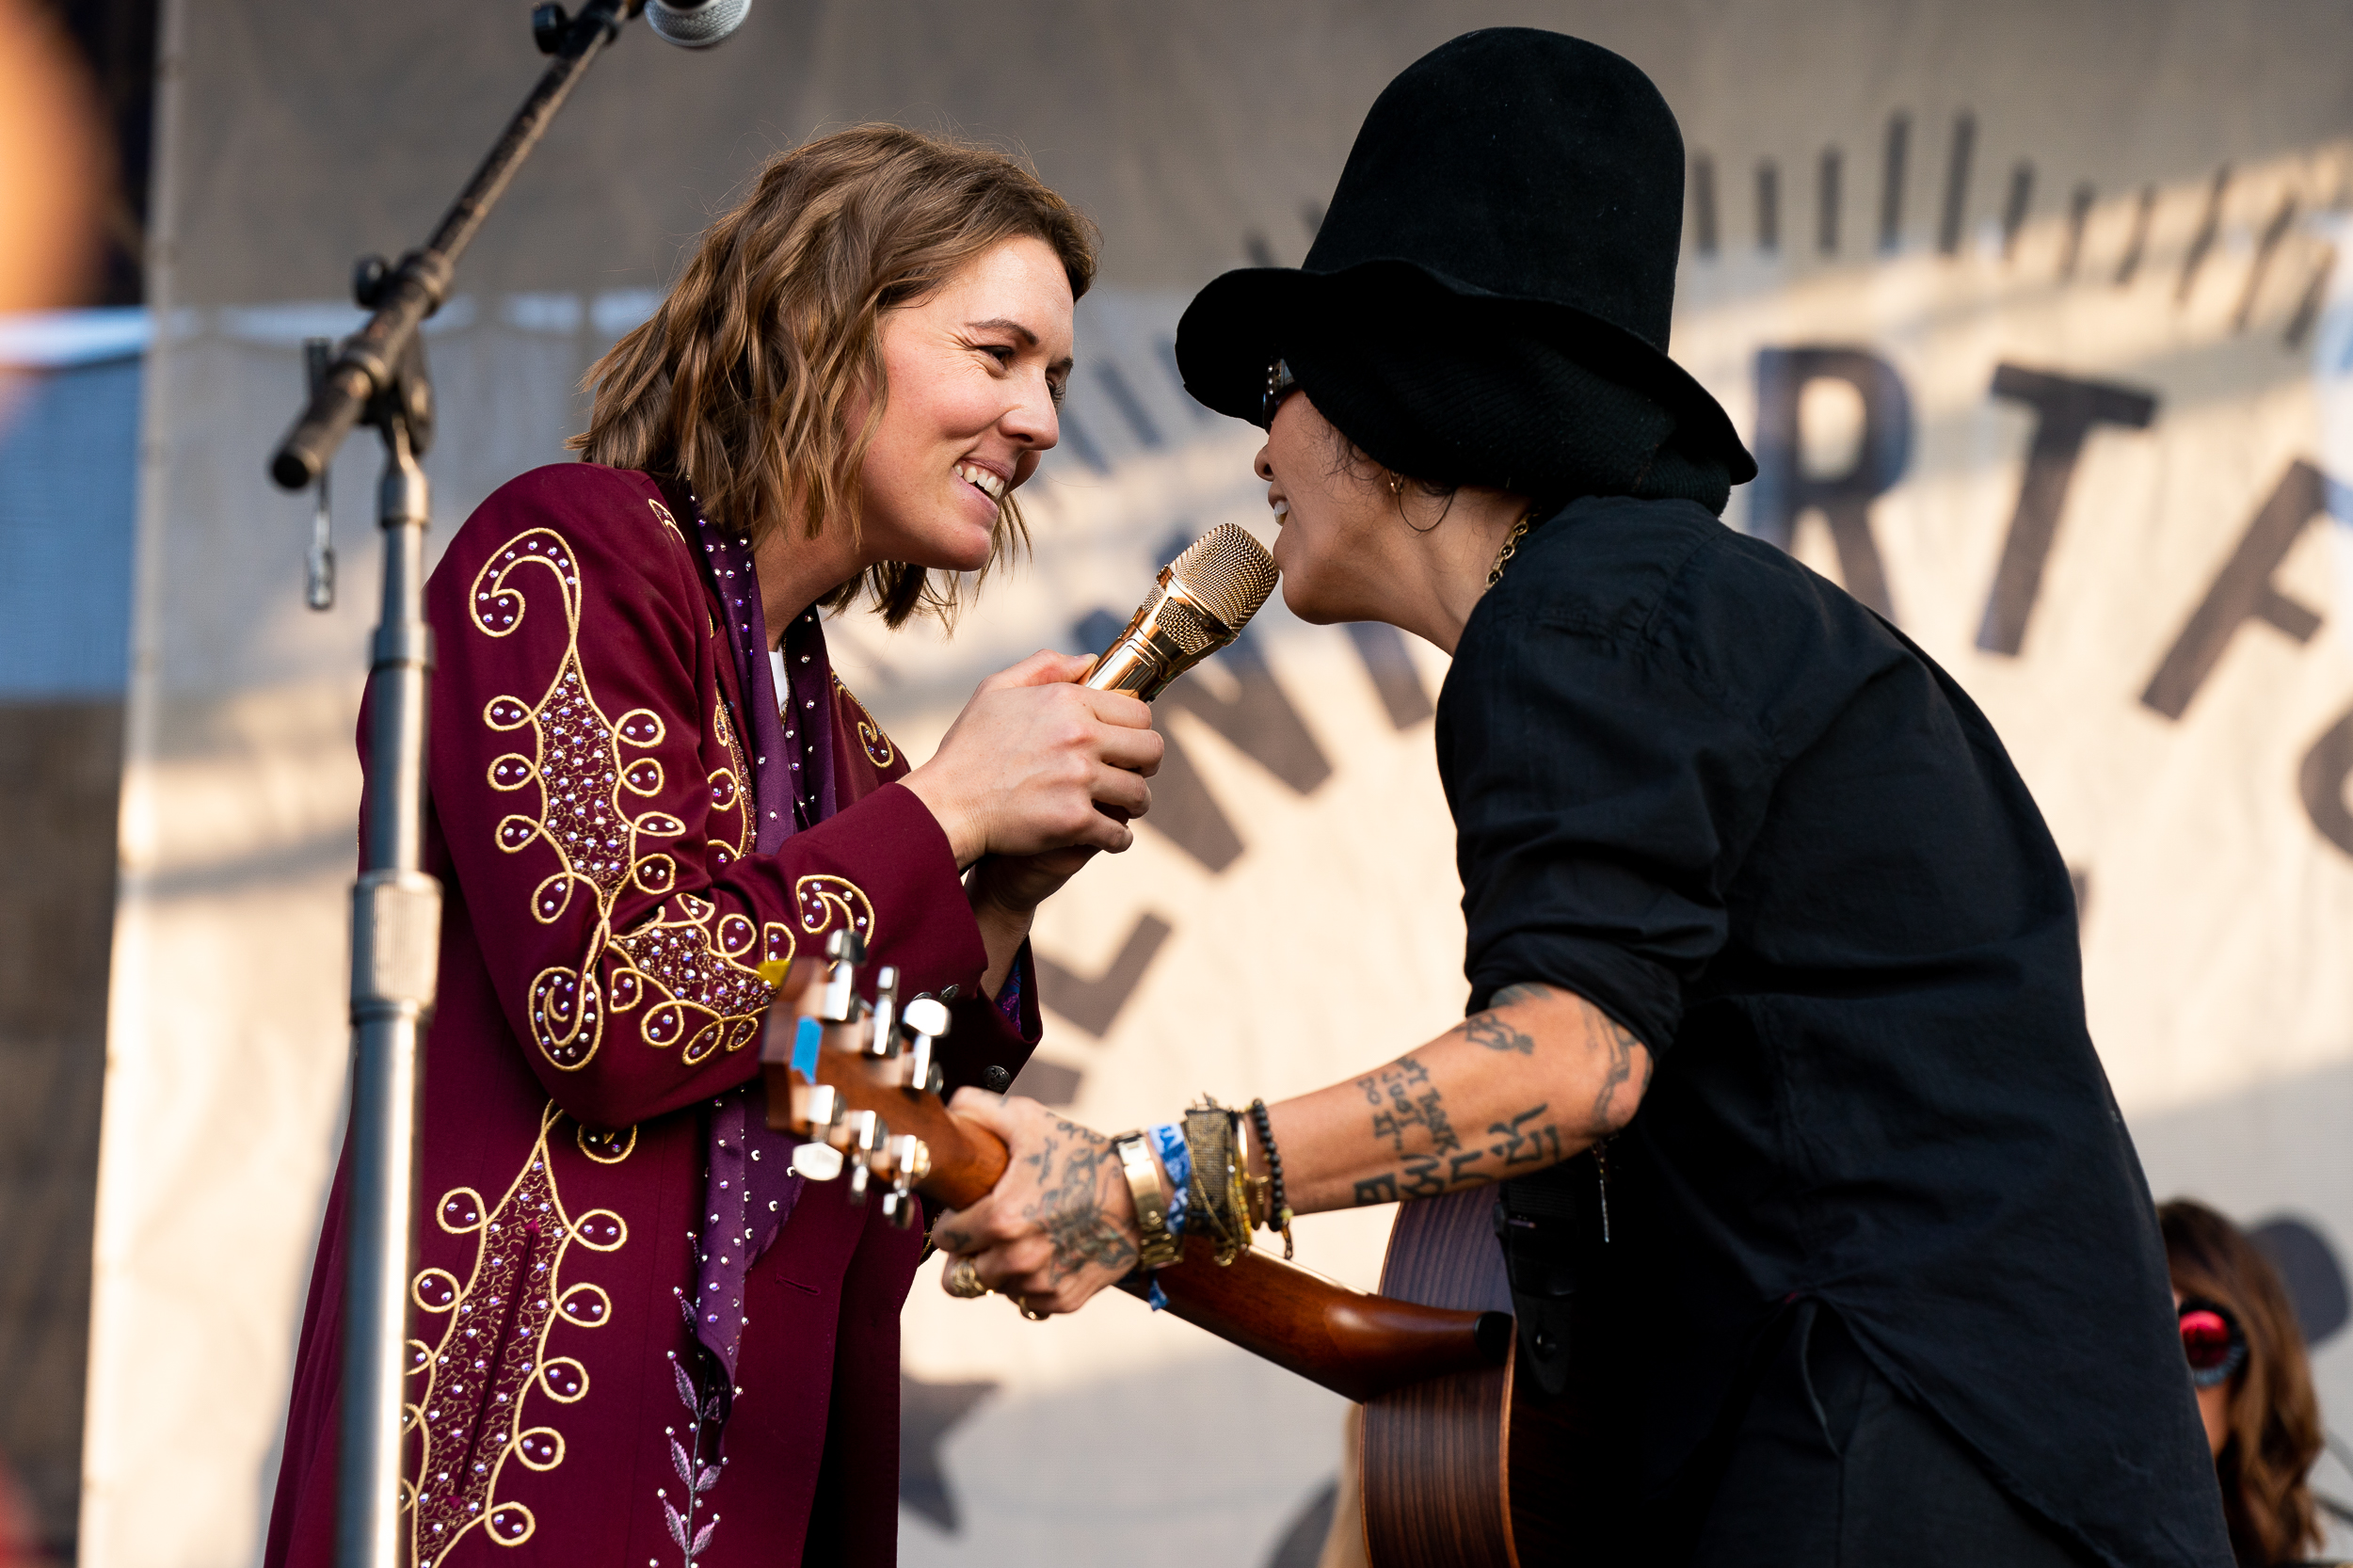 Brandi Carlile and Linda Perry at Newport Folk Festival (Photo by Mauricio Castro)